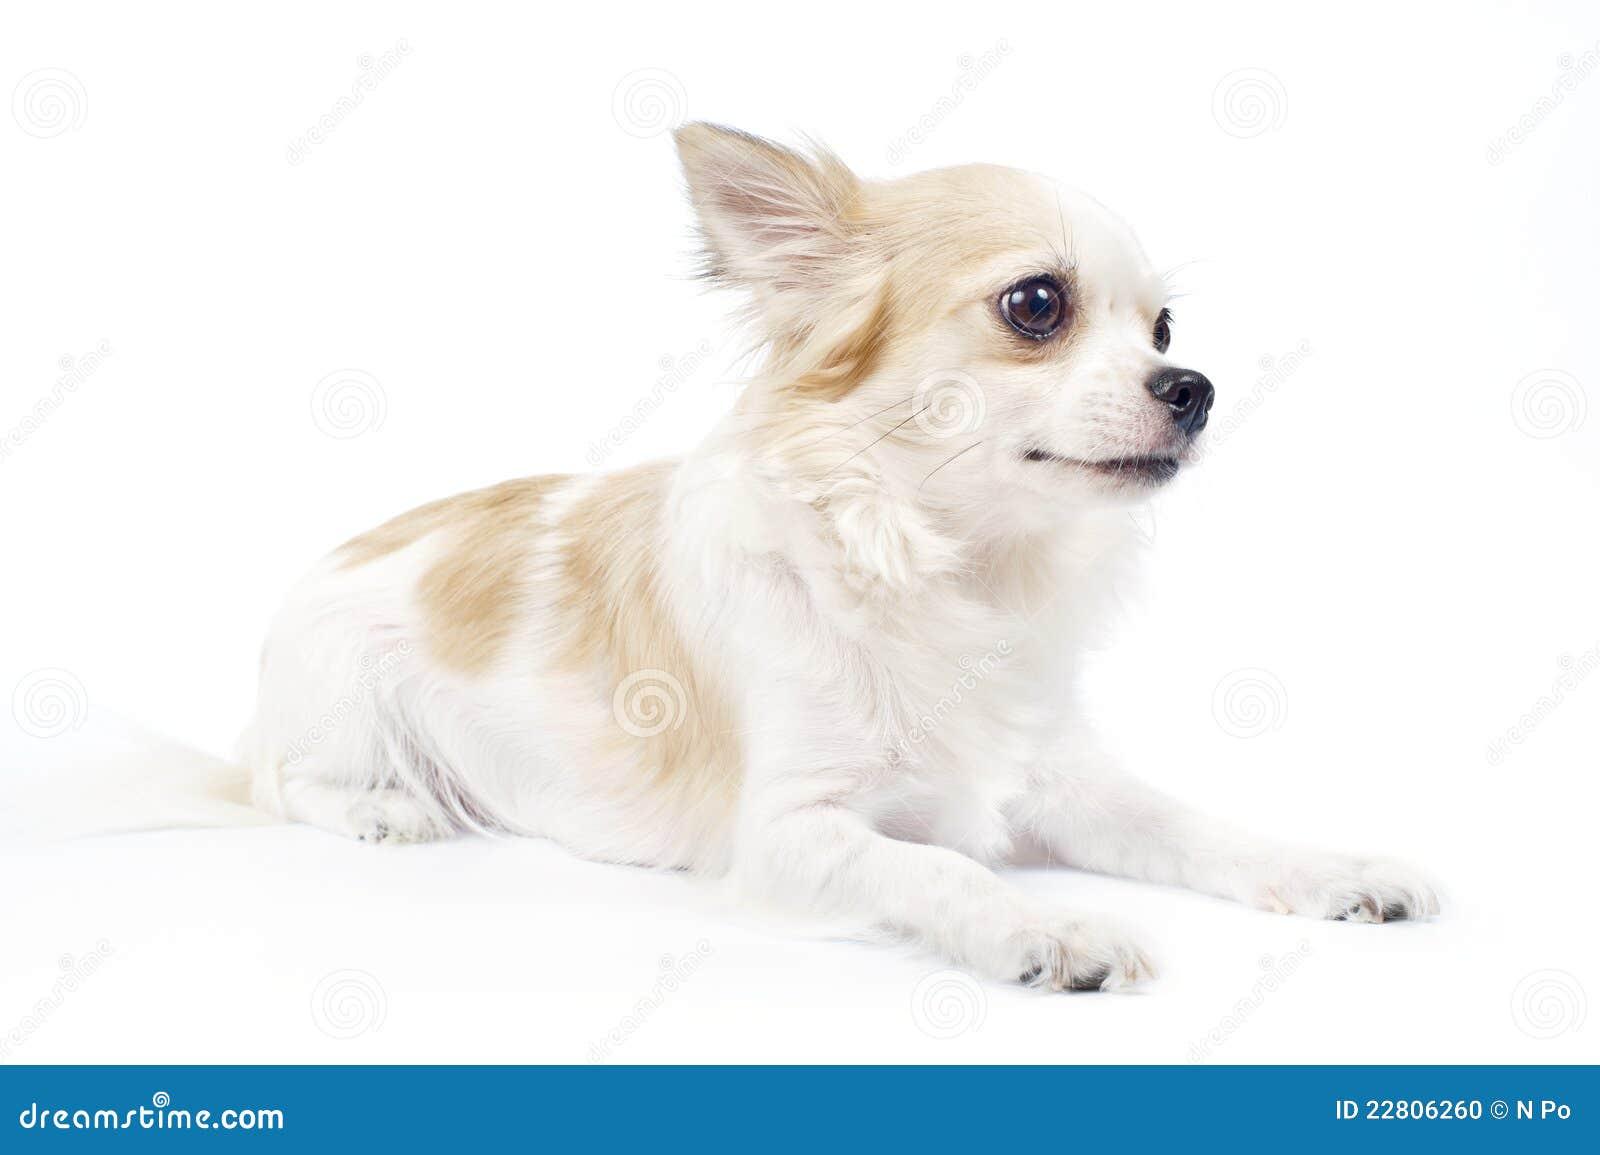 perro chihuahua fondo de - photo #1